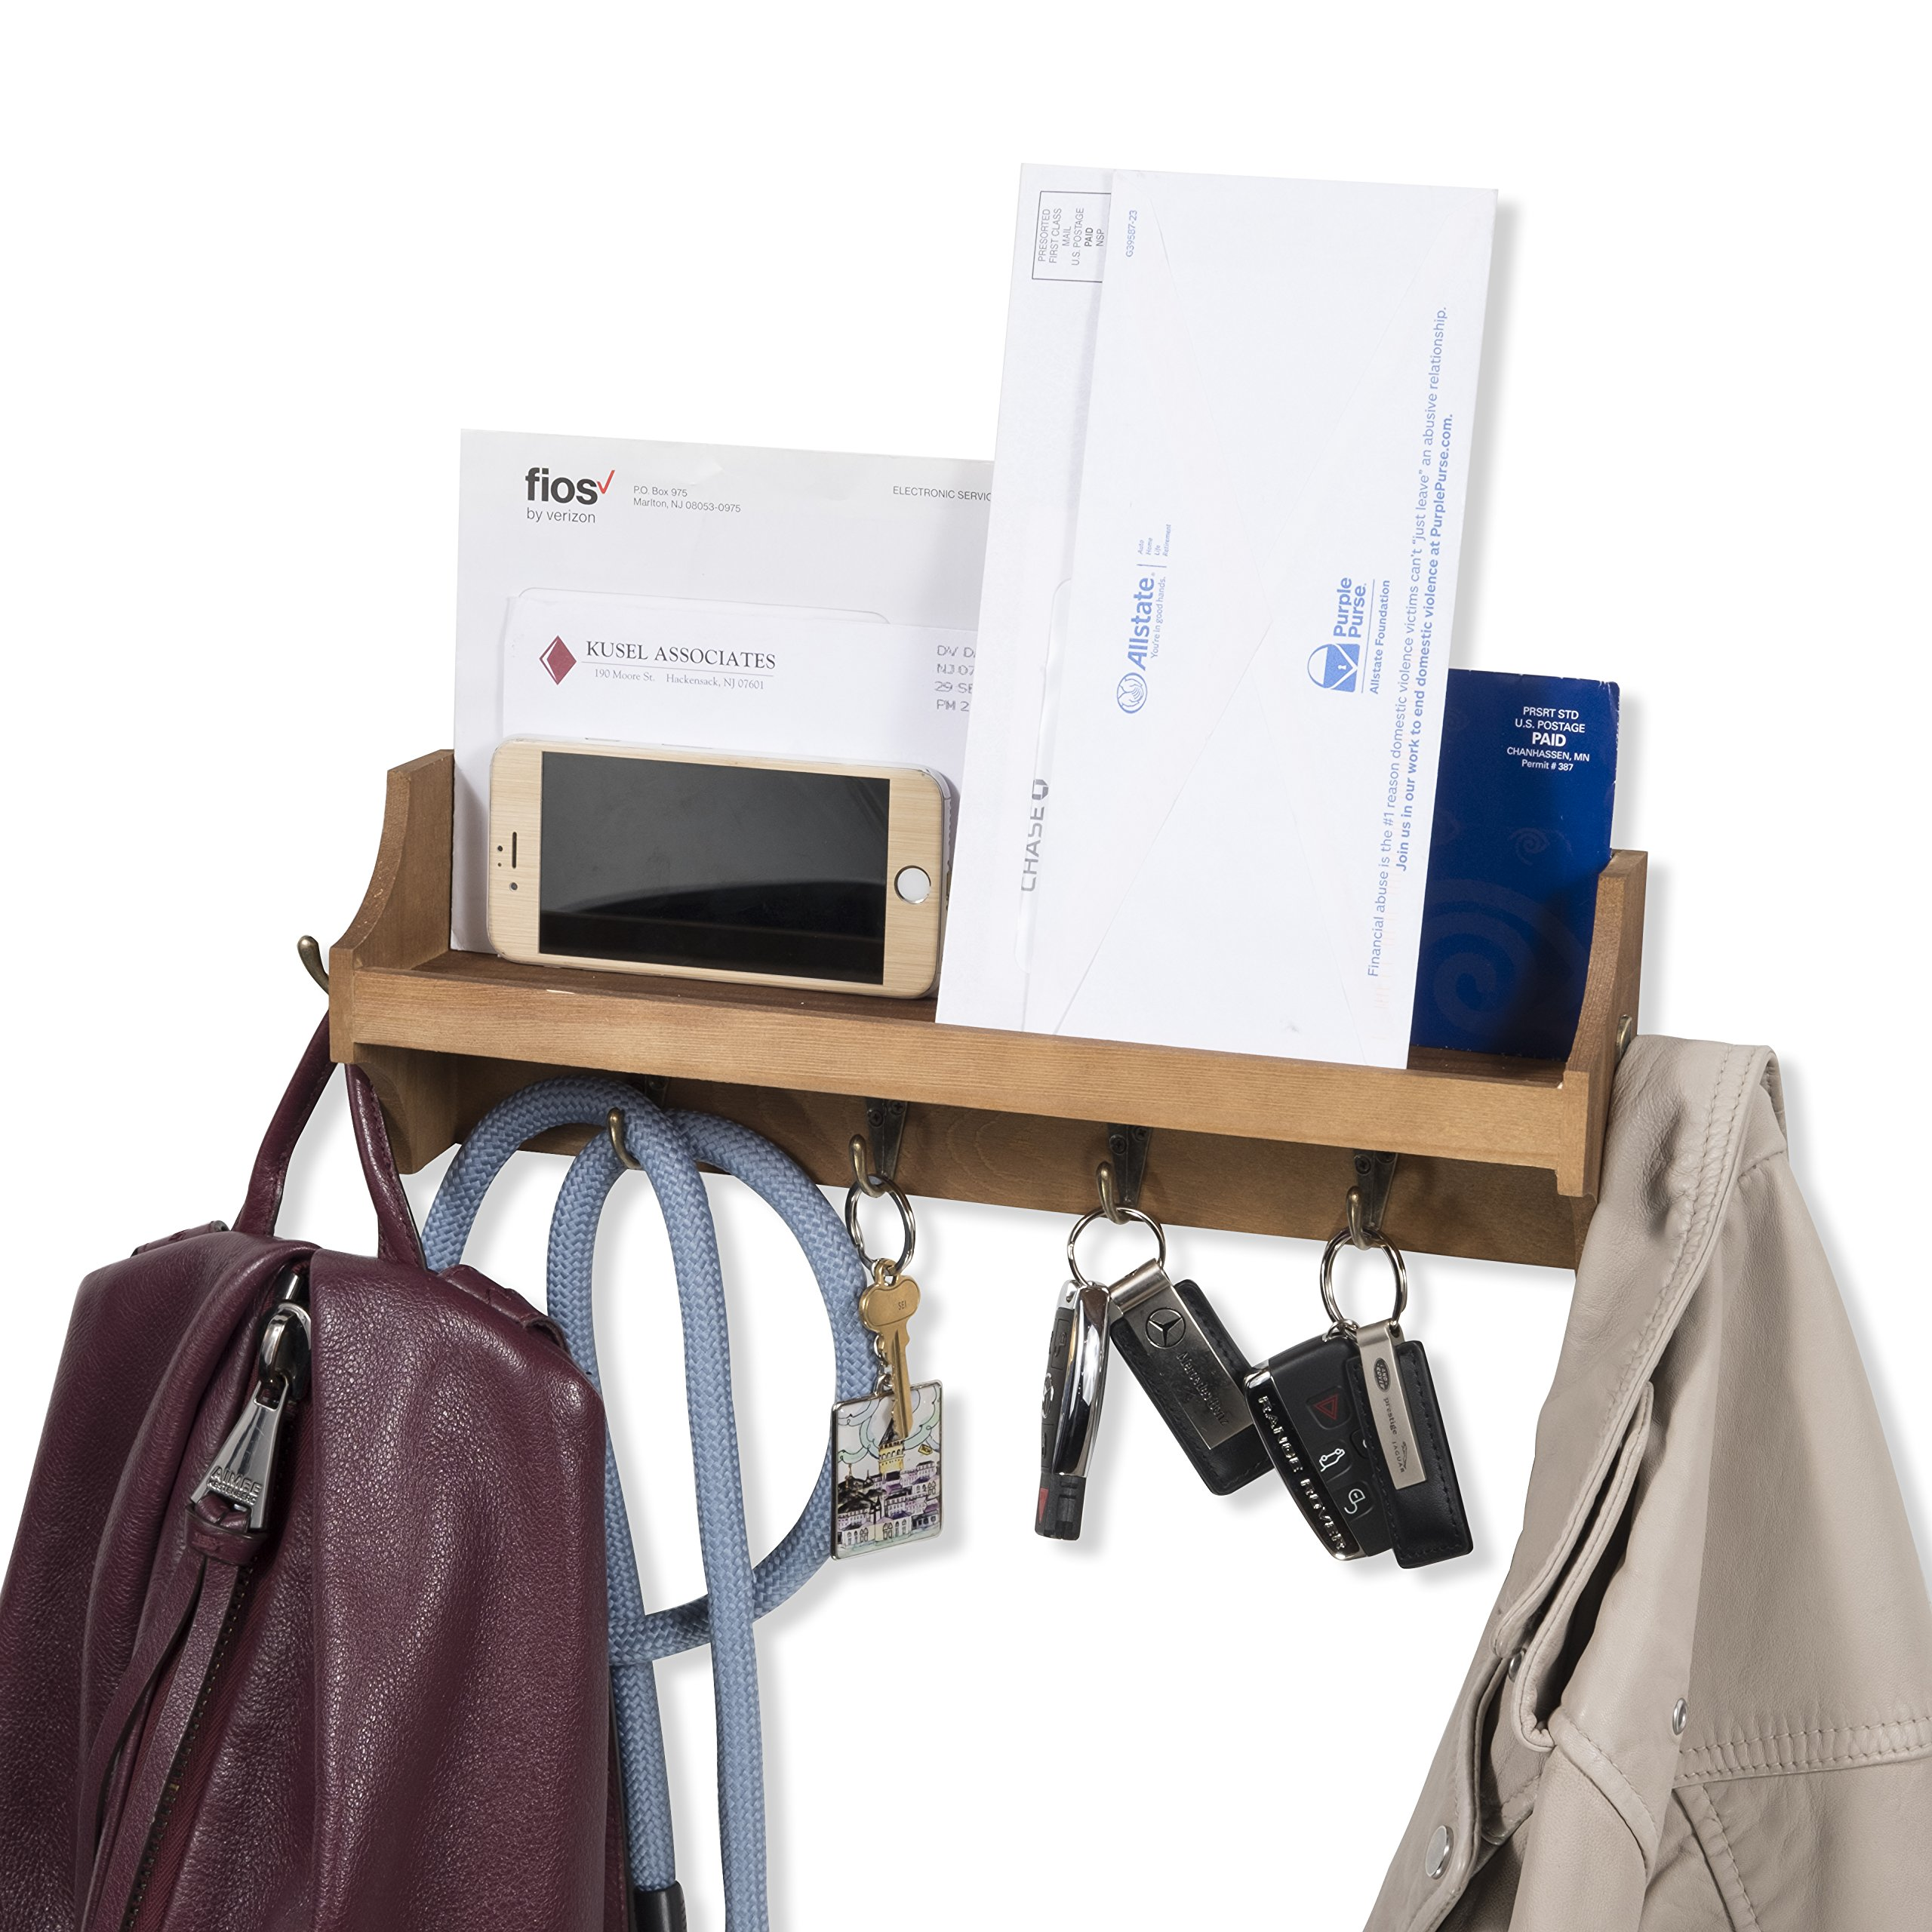 Brightmaison Small Coat Rack Shelf Wall-Mounted with Hooks Wood Entryway Organizer Key Phone Mail Holder (Walnut)